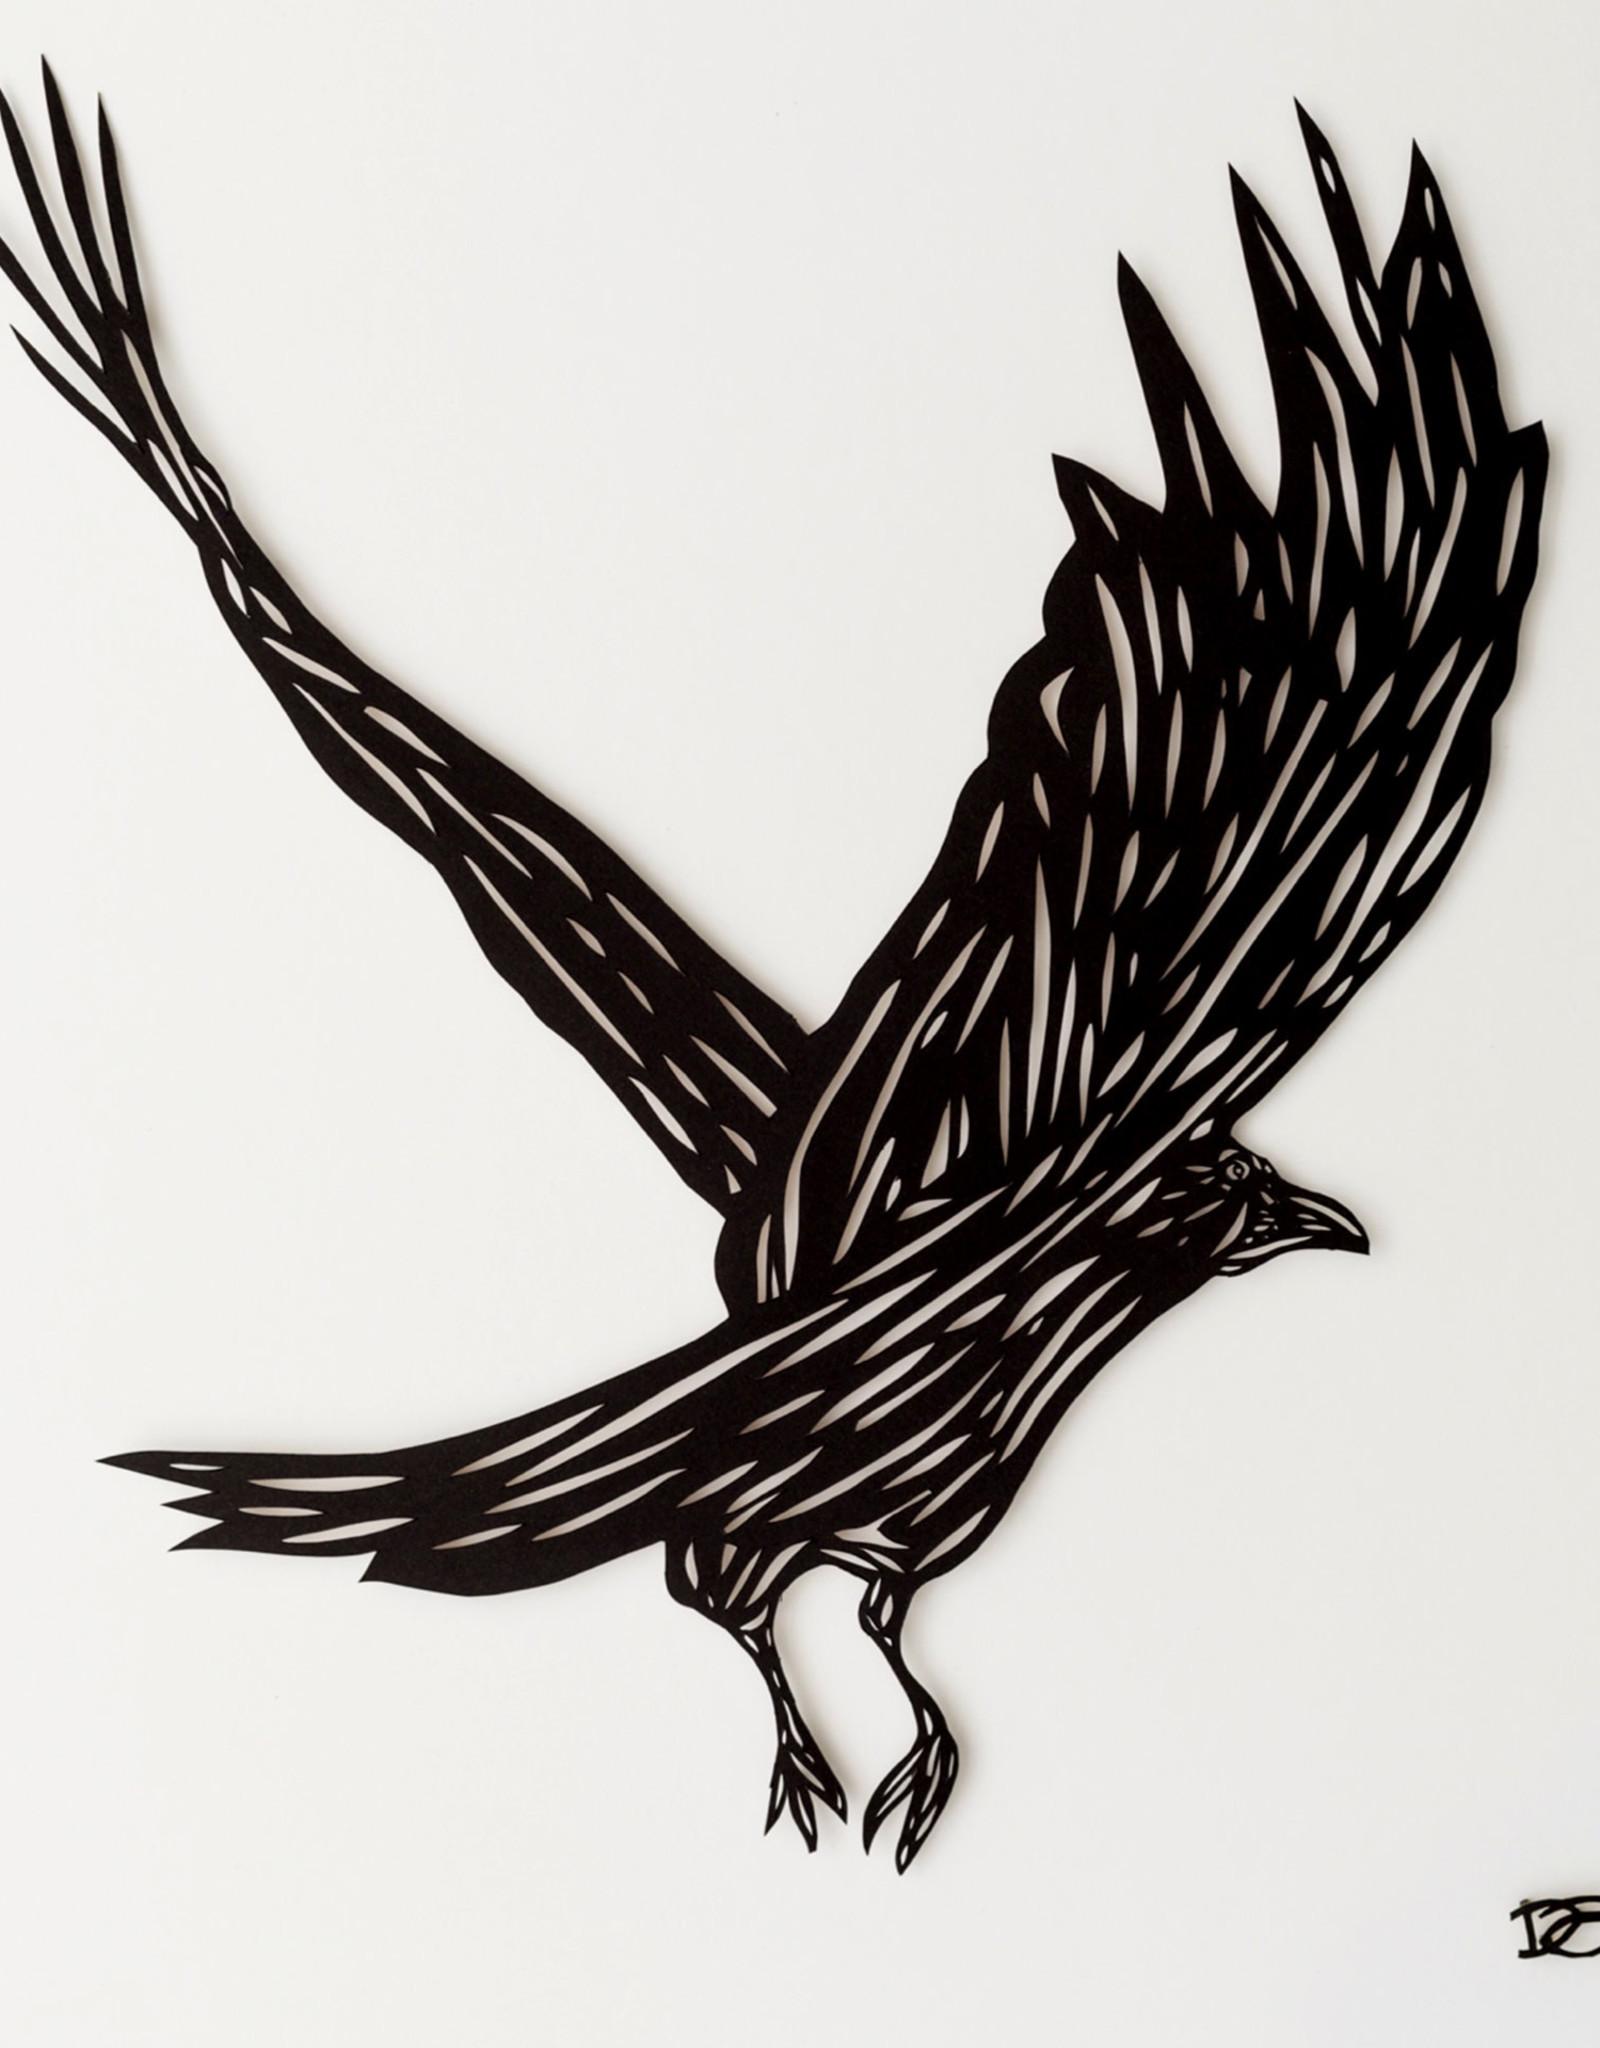 David Friedman Crow Ascending